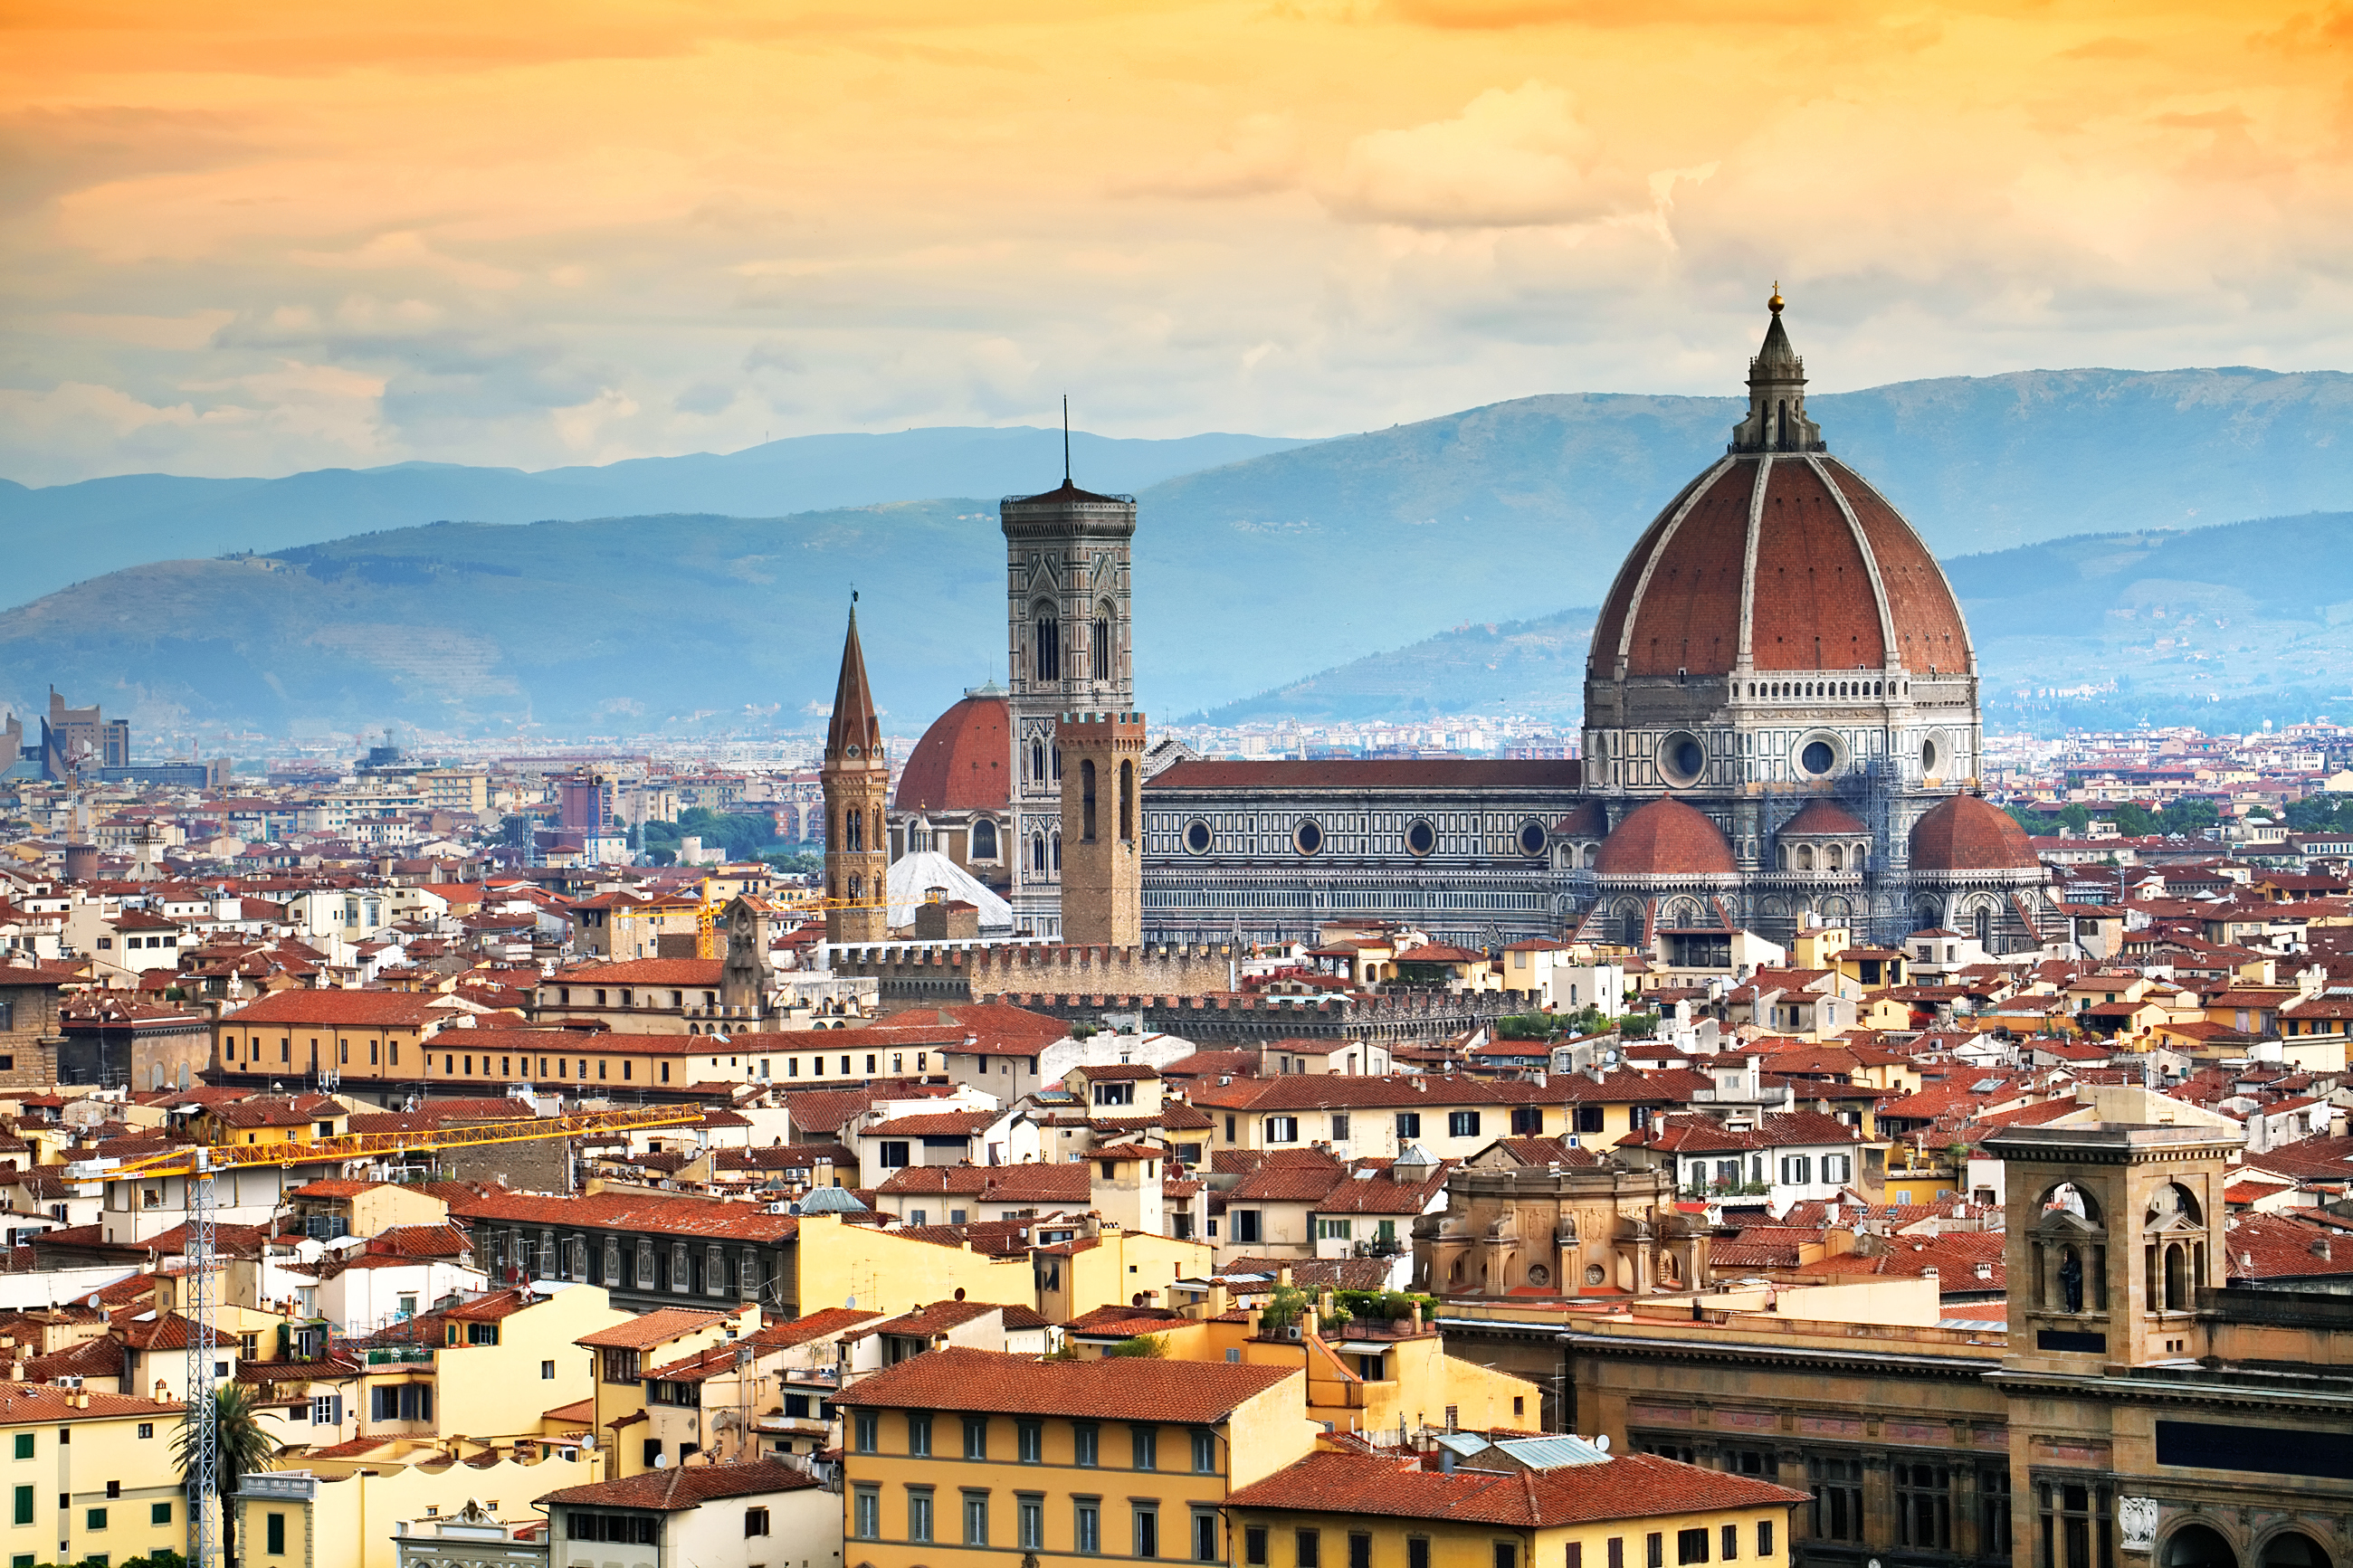 Toskania, kolebka renesansu